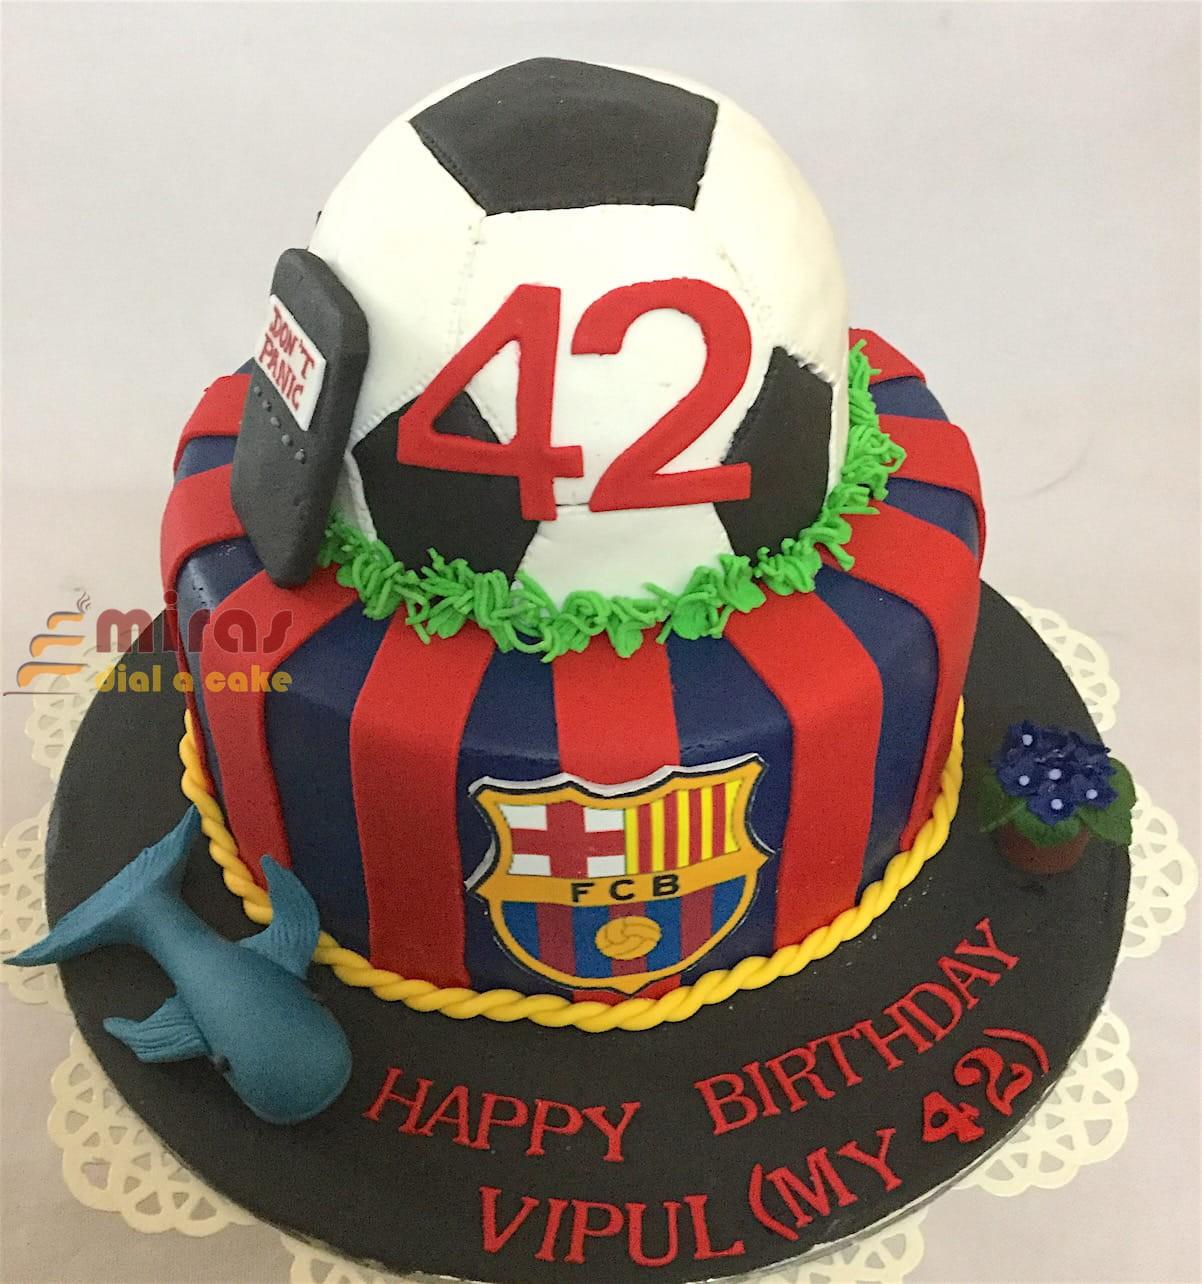 Swell Customized Theme Cakes For Birthday Wedding Anniversary Baby Funny Birthday Cards Online Fluifree Goldxyz